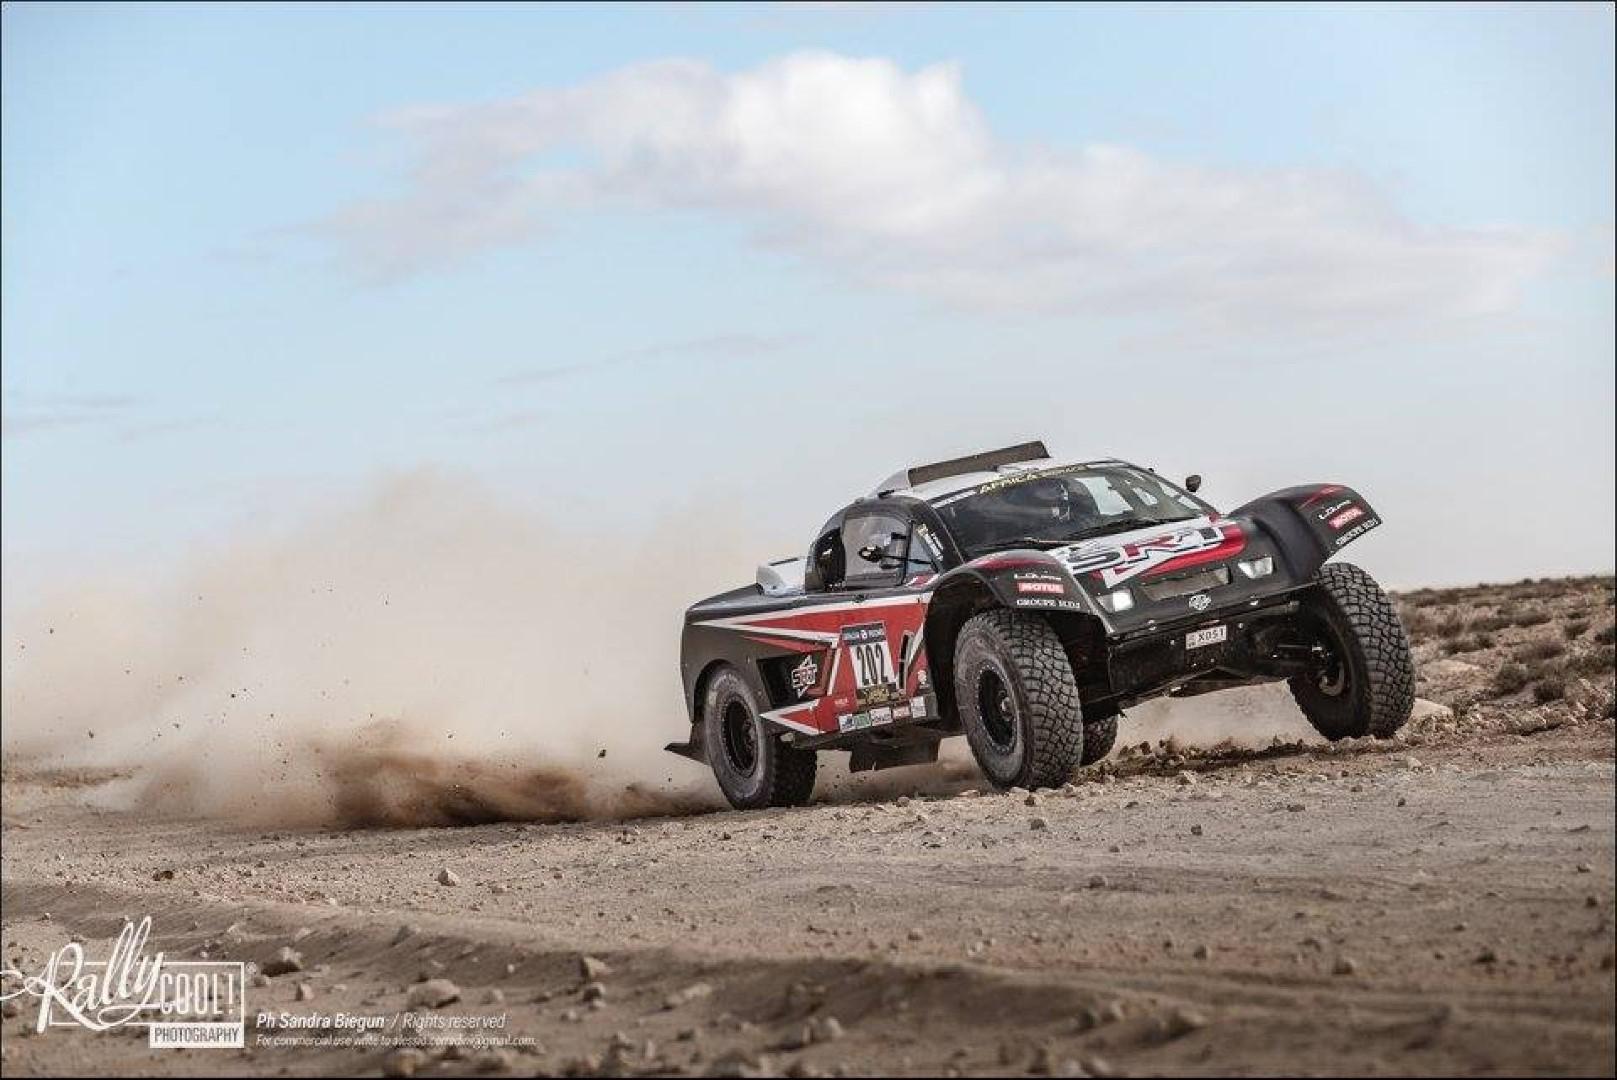 Africa Eco Race 2018 : Le rallye change de pays, Serradori change de rythme.